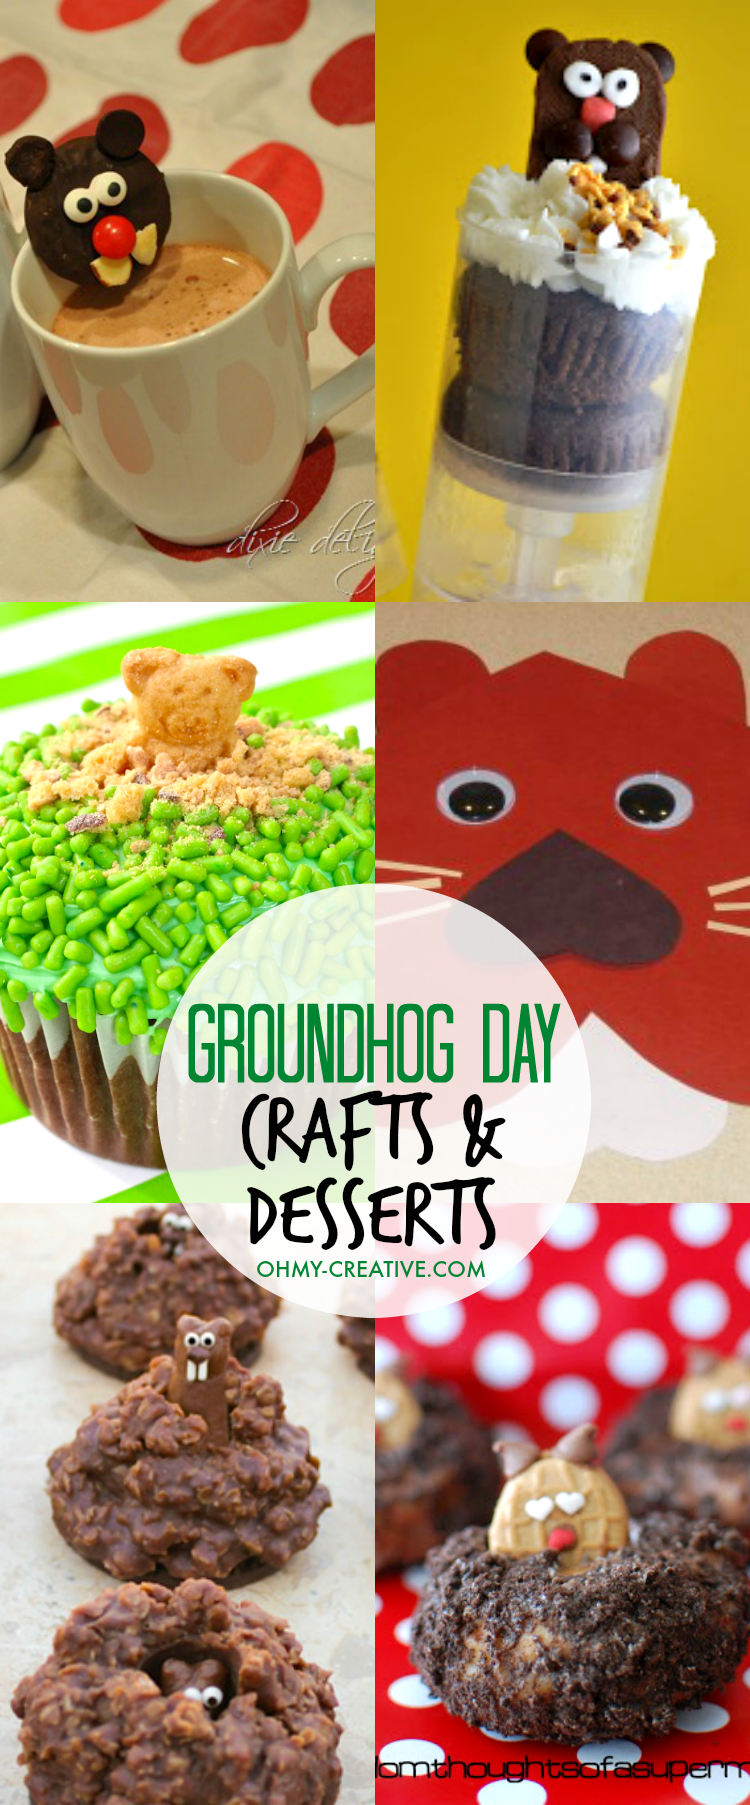 Fun Groundhog Day Kids Crafts and Desserts! Adorable Groundhog Day preschooler ideas or Groundhog Day kindergarten ideas too! | OHMY-CREATIVE.COM